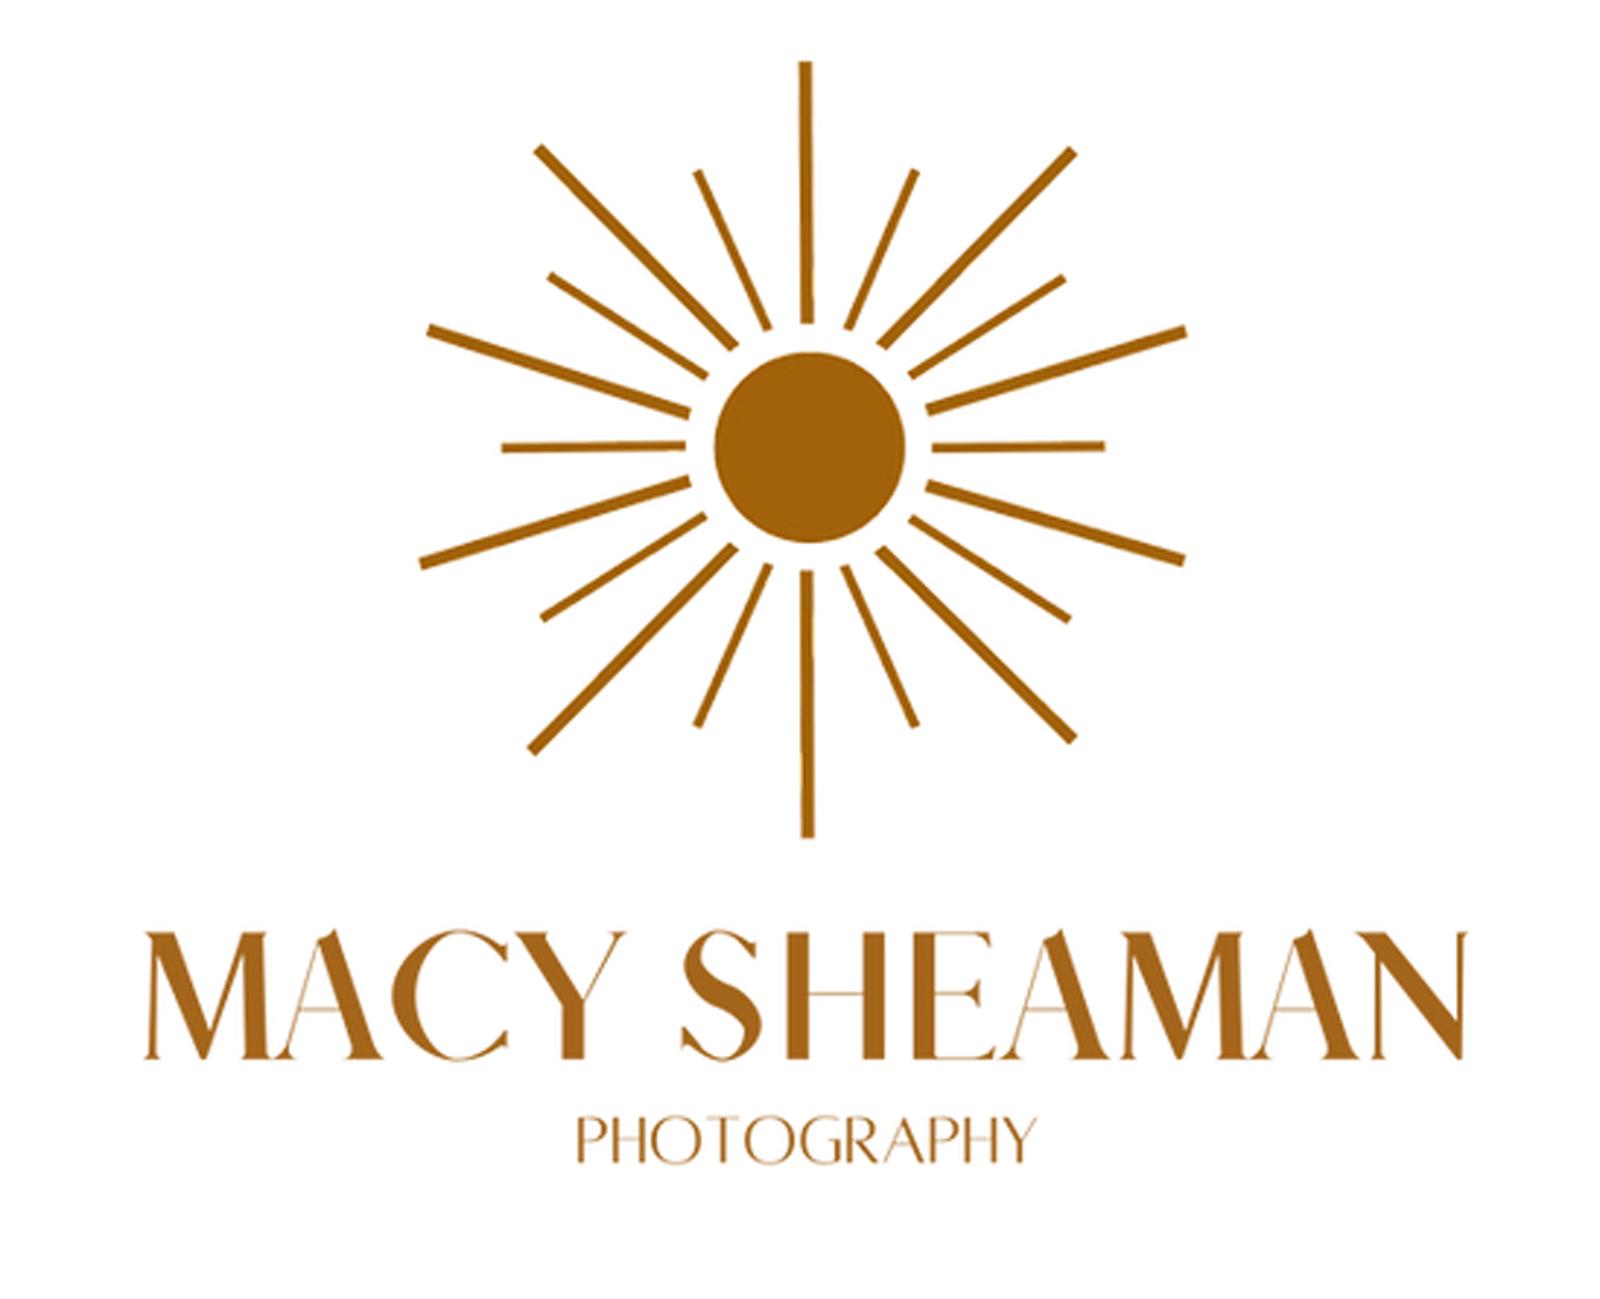 Macy Sheaman Photography